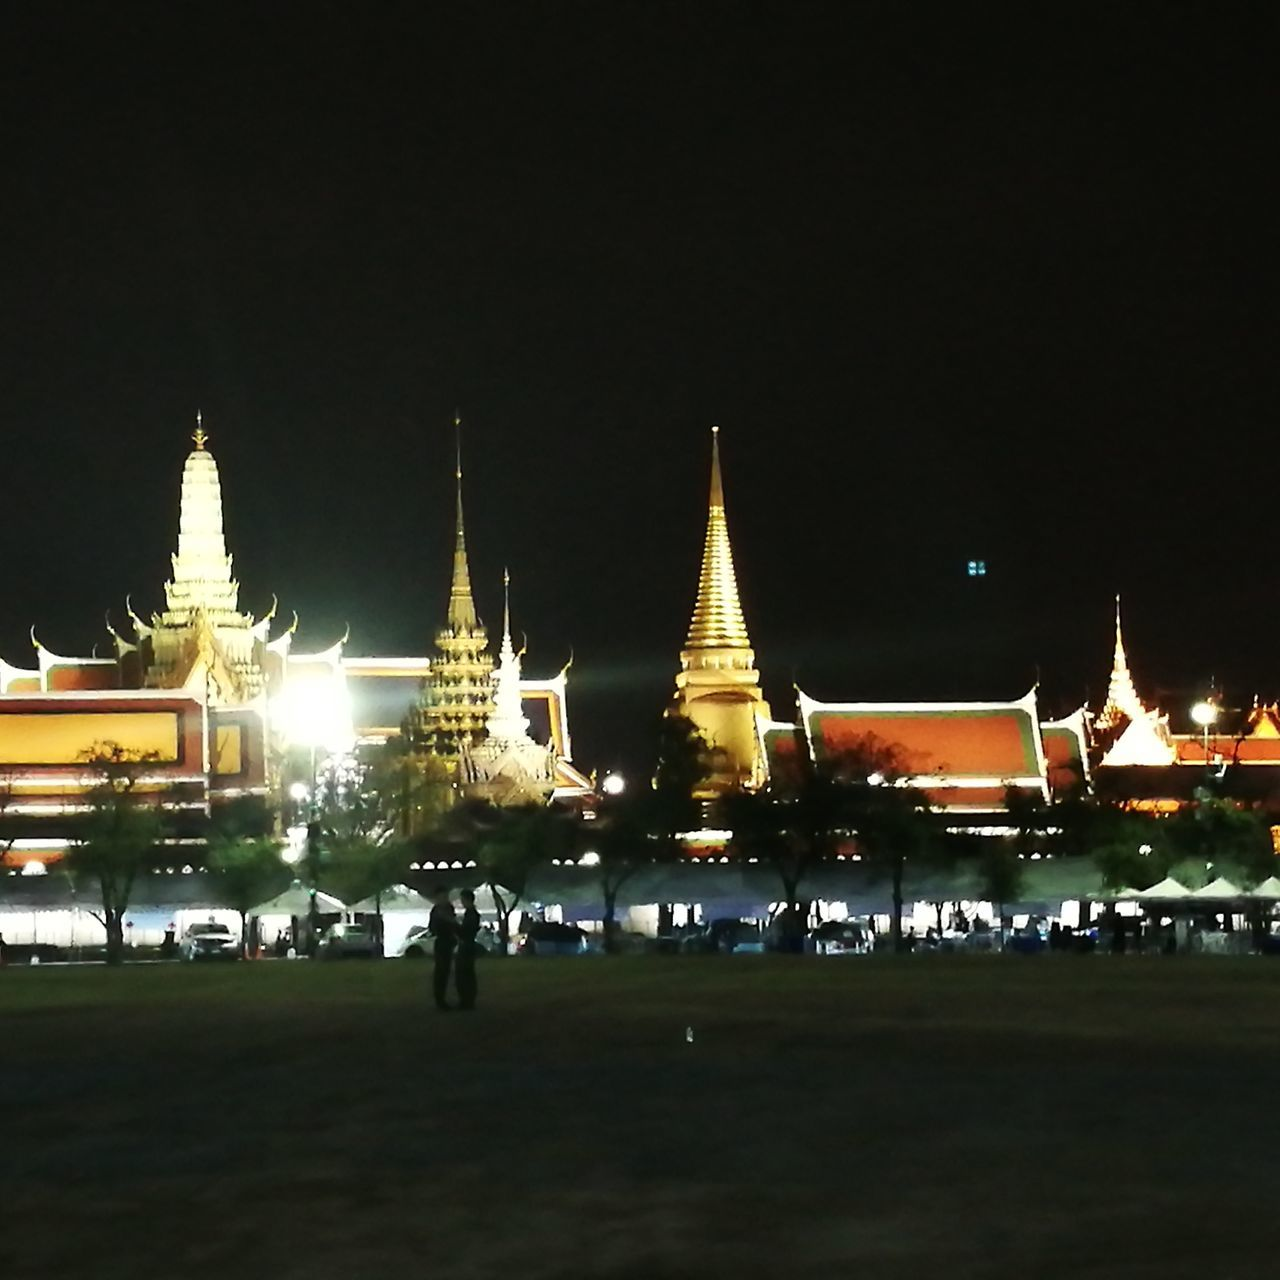 Travel Destinations Night Architecture Tourism Travel HuaweiP9 Grand Palace Bangkok Thailand Respect